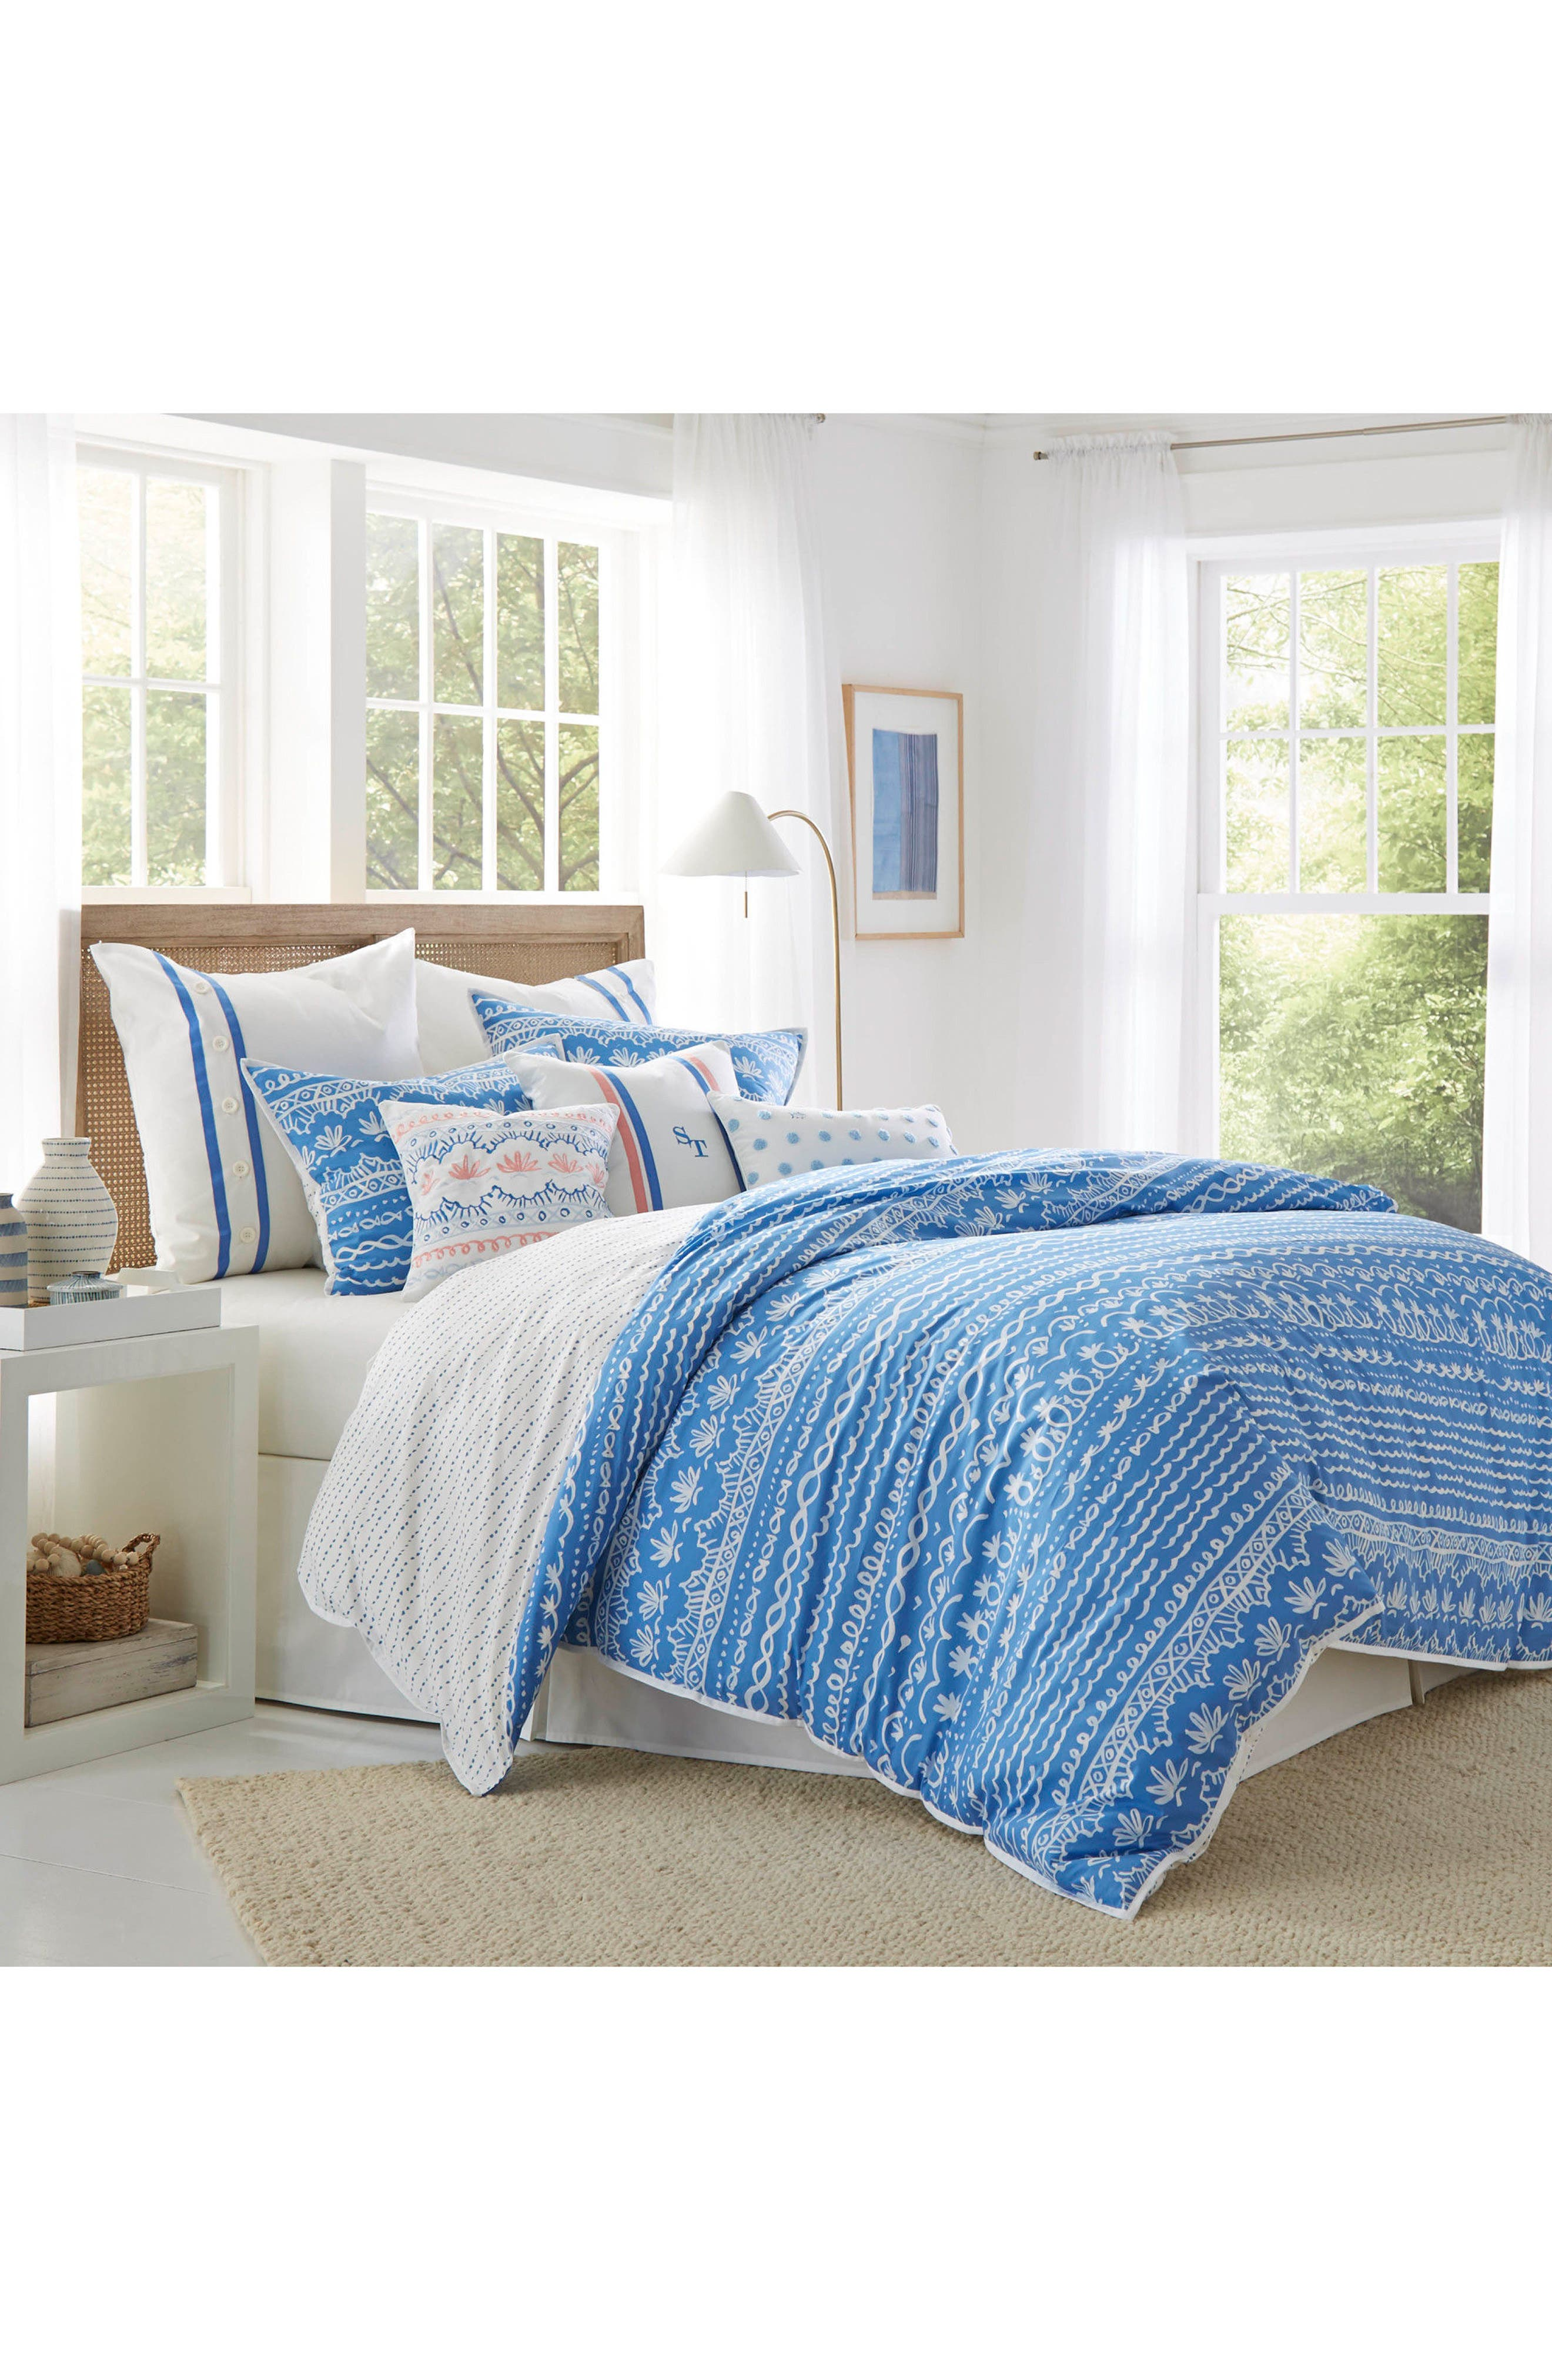 Summer Daze Comforter Set,                             Main thumbnail 1, color,                             400